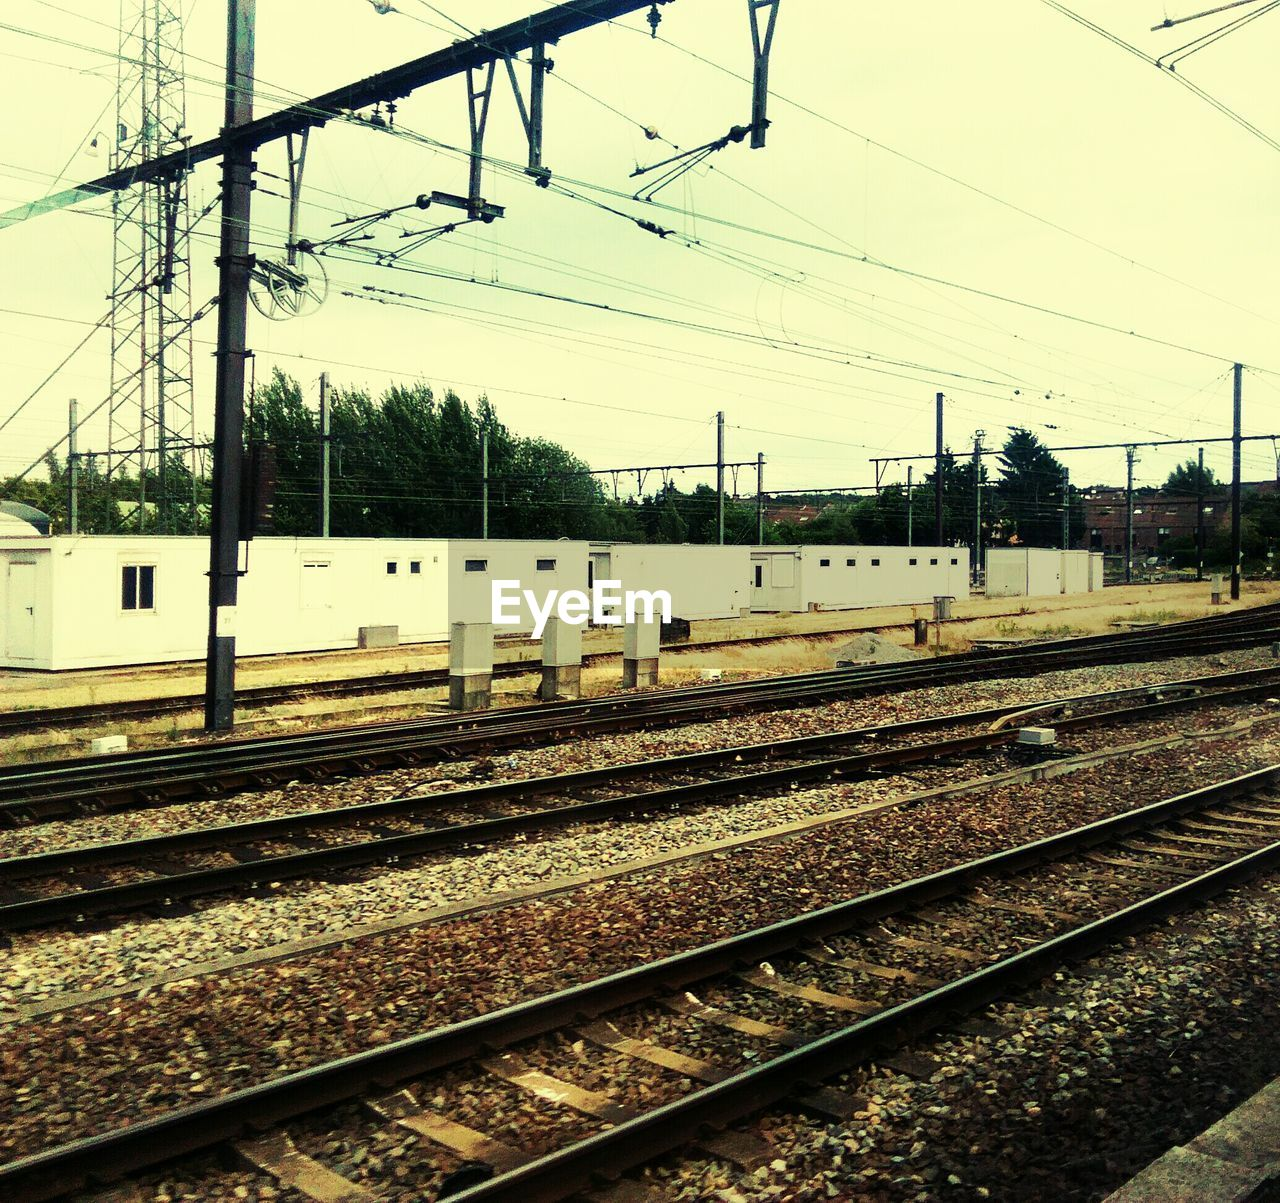 railroad track, rail transportation, cable, transportation, power line, electricity pylon, power supply, railway track, no people, electricity, railroad station platform, day, outdoors, railway, sky